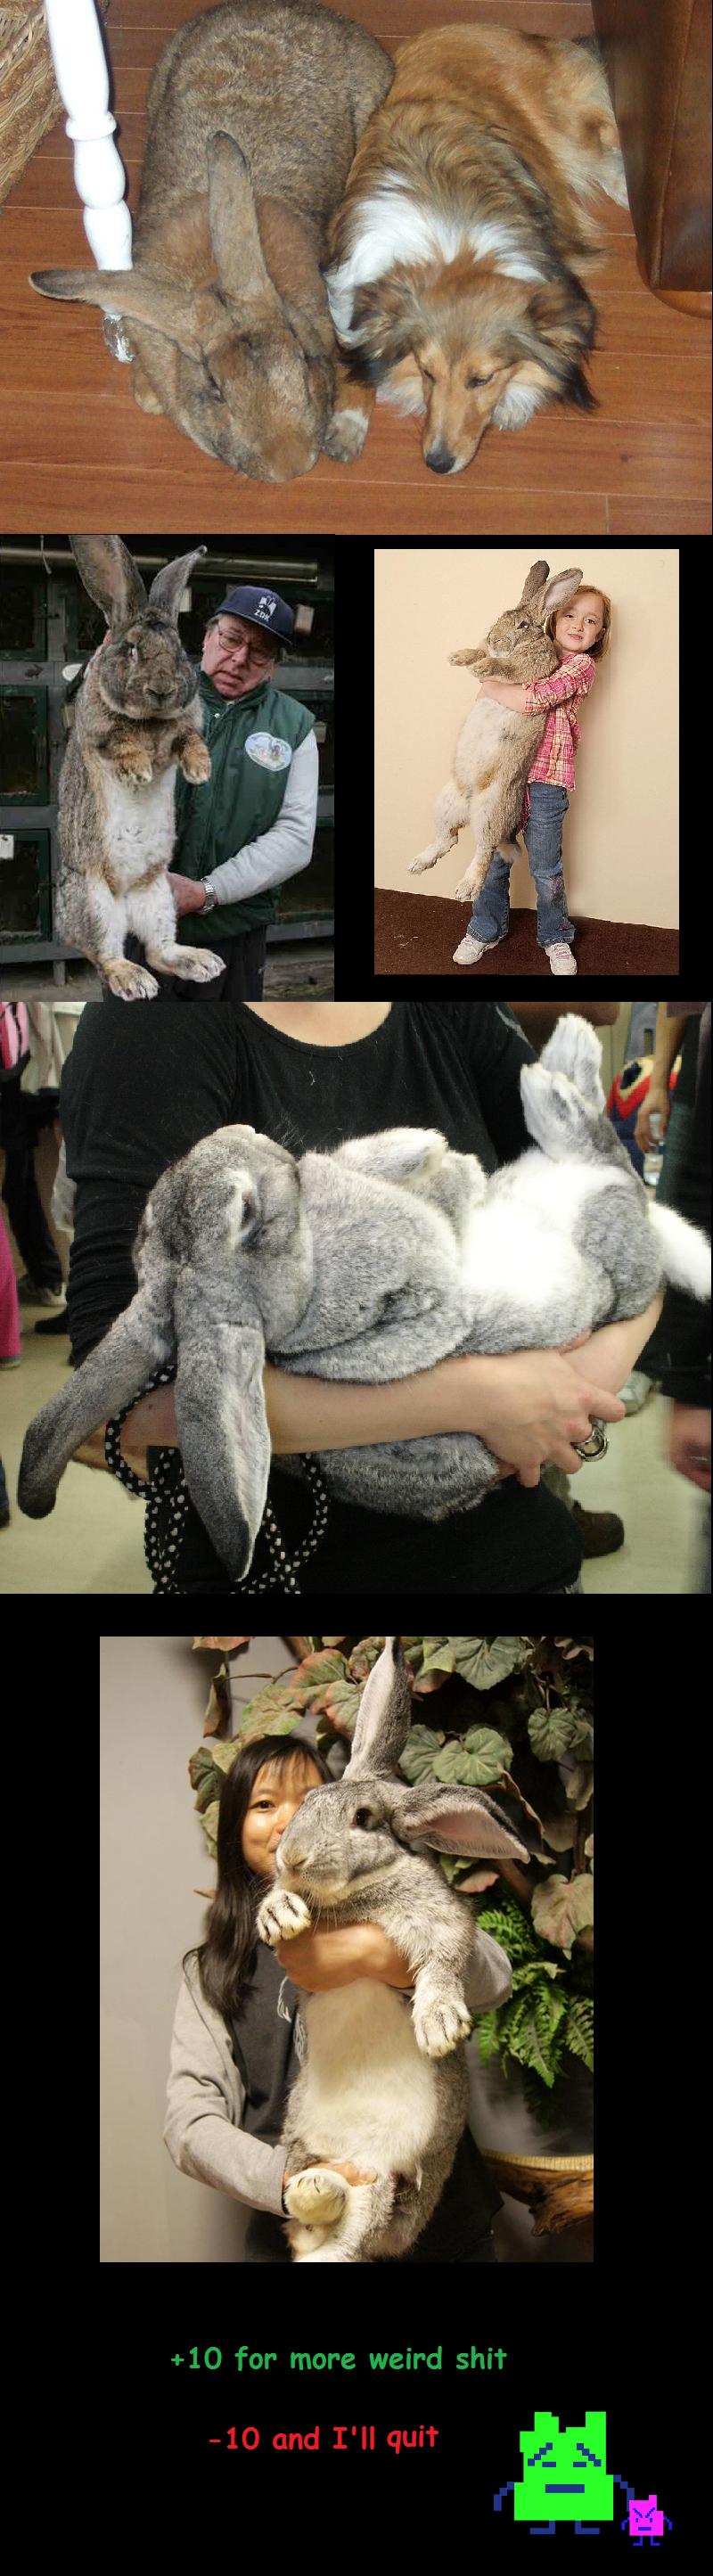 Rhosgobel Rabbits Tho.... en.wikipedia.org/wiki/Flemish_Giant.. can't outrun me! Rhosgobel Rabbits Tho en wikipedia org/wiki/Flemish_Giant can't outrun me!